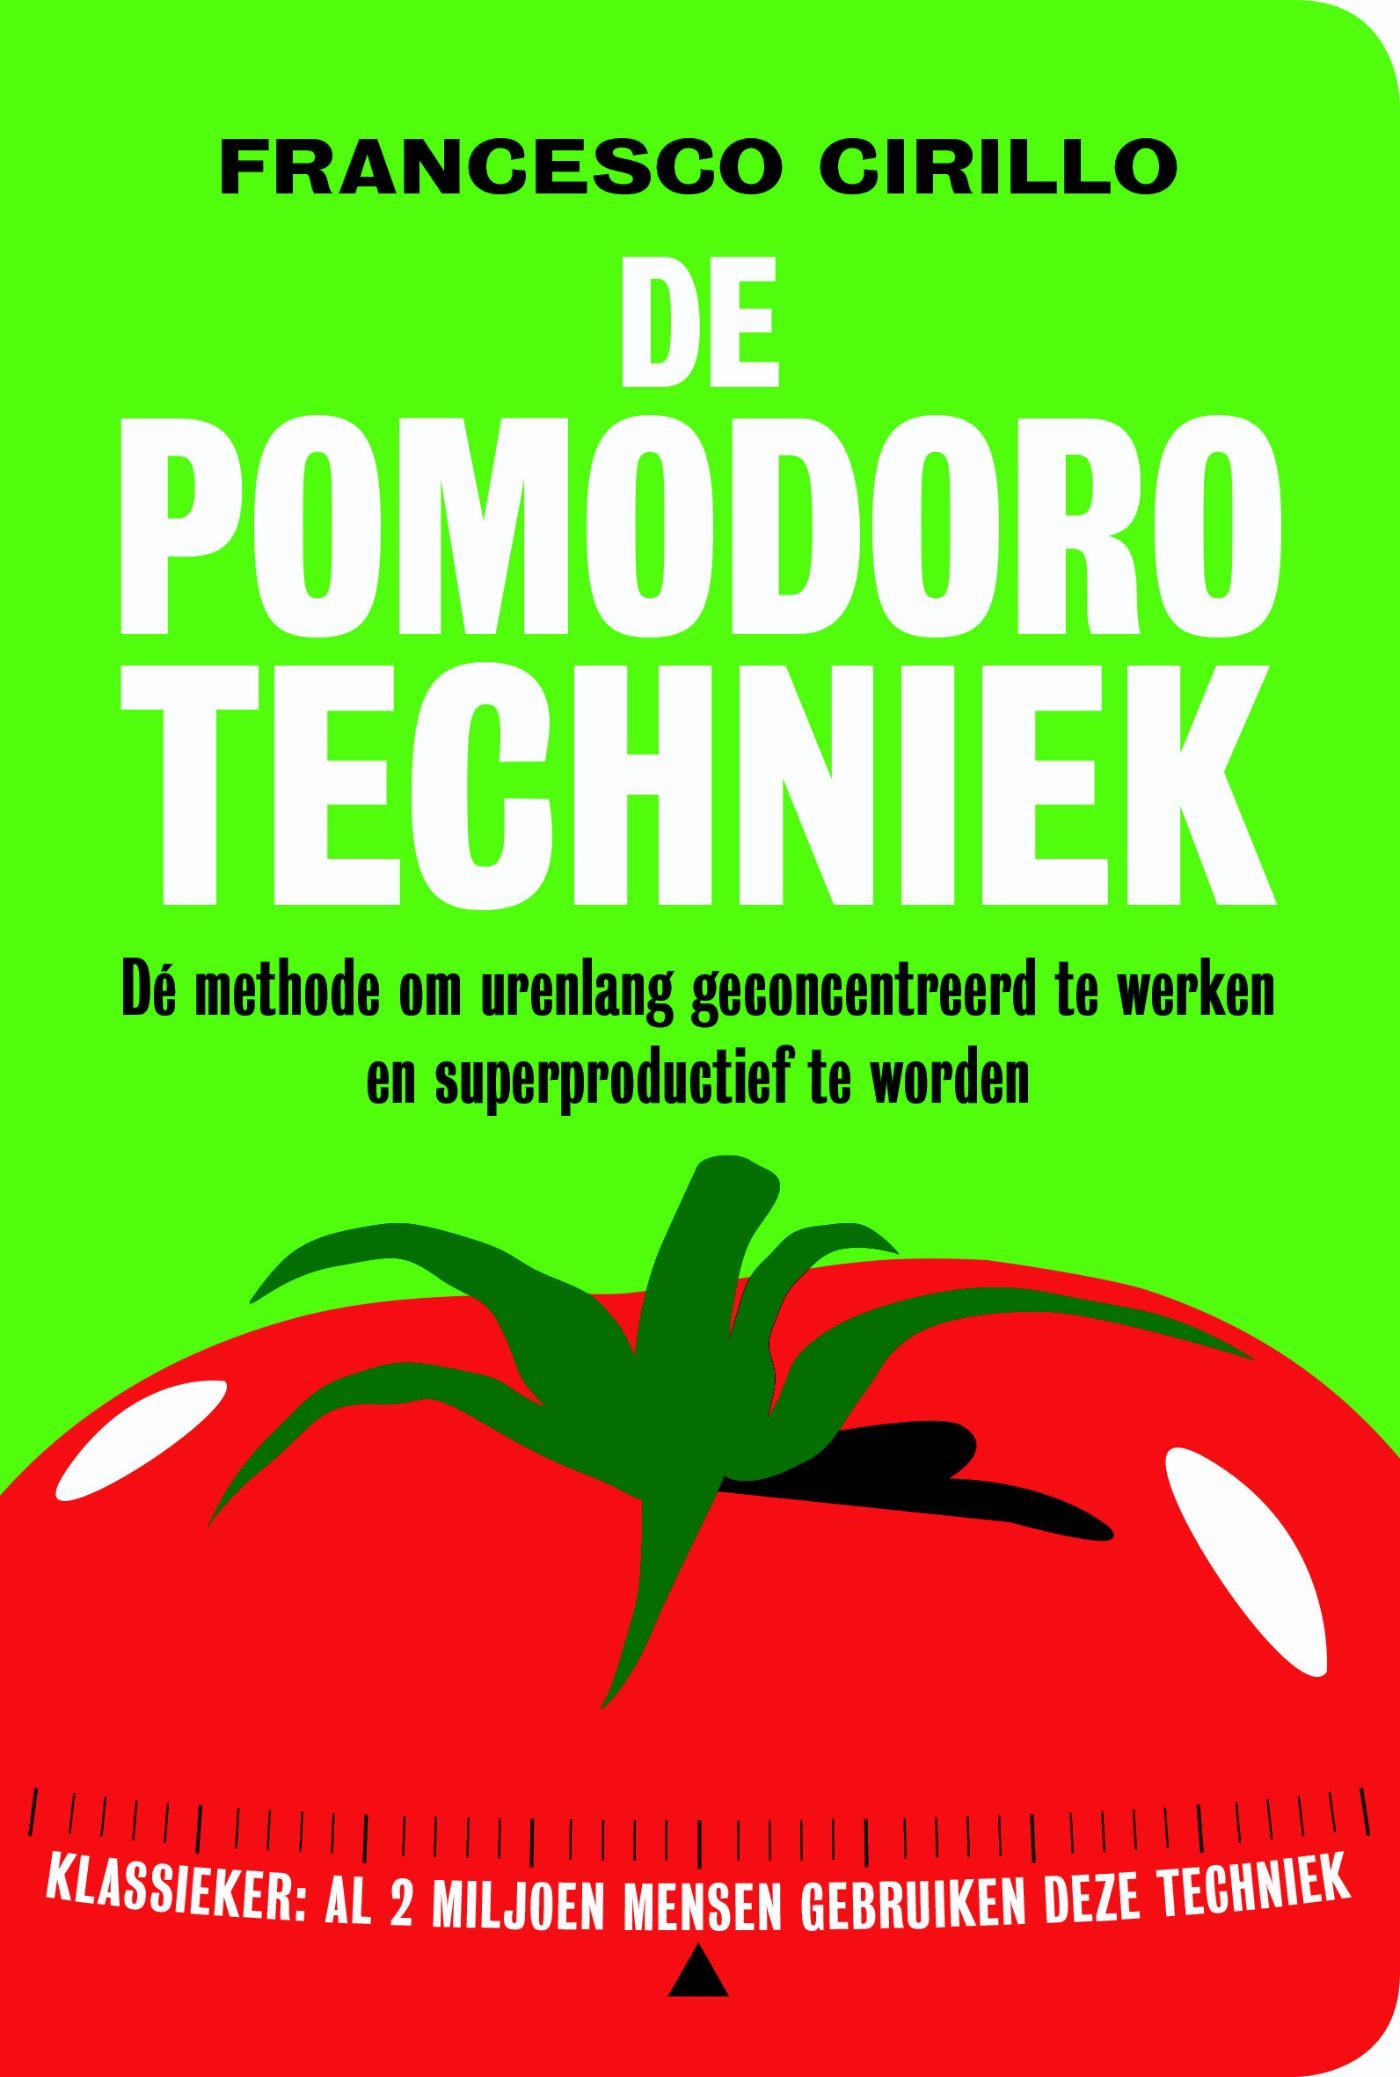 Cover De pomodoro techniek